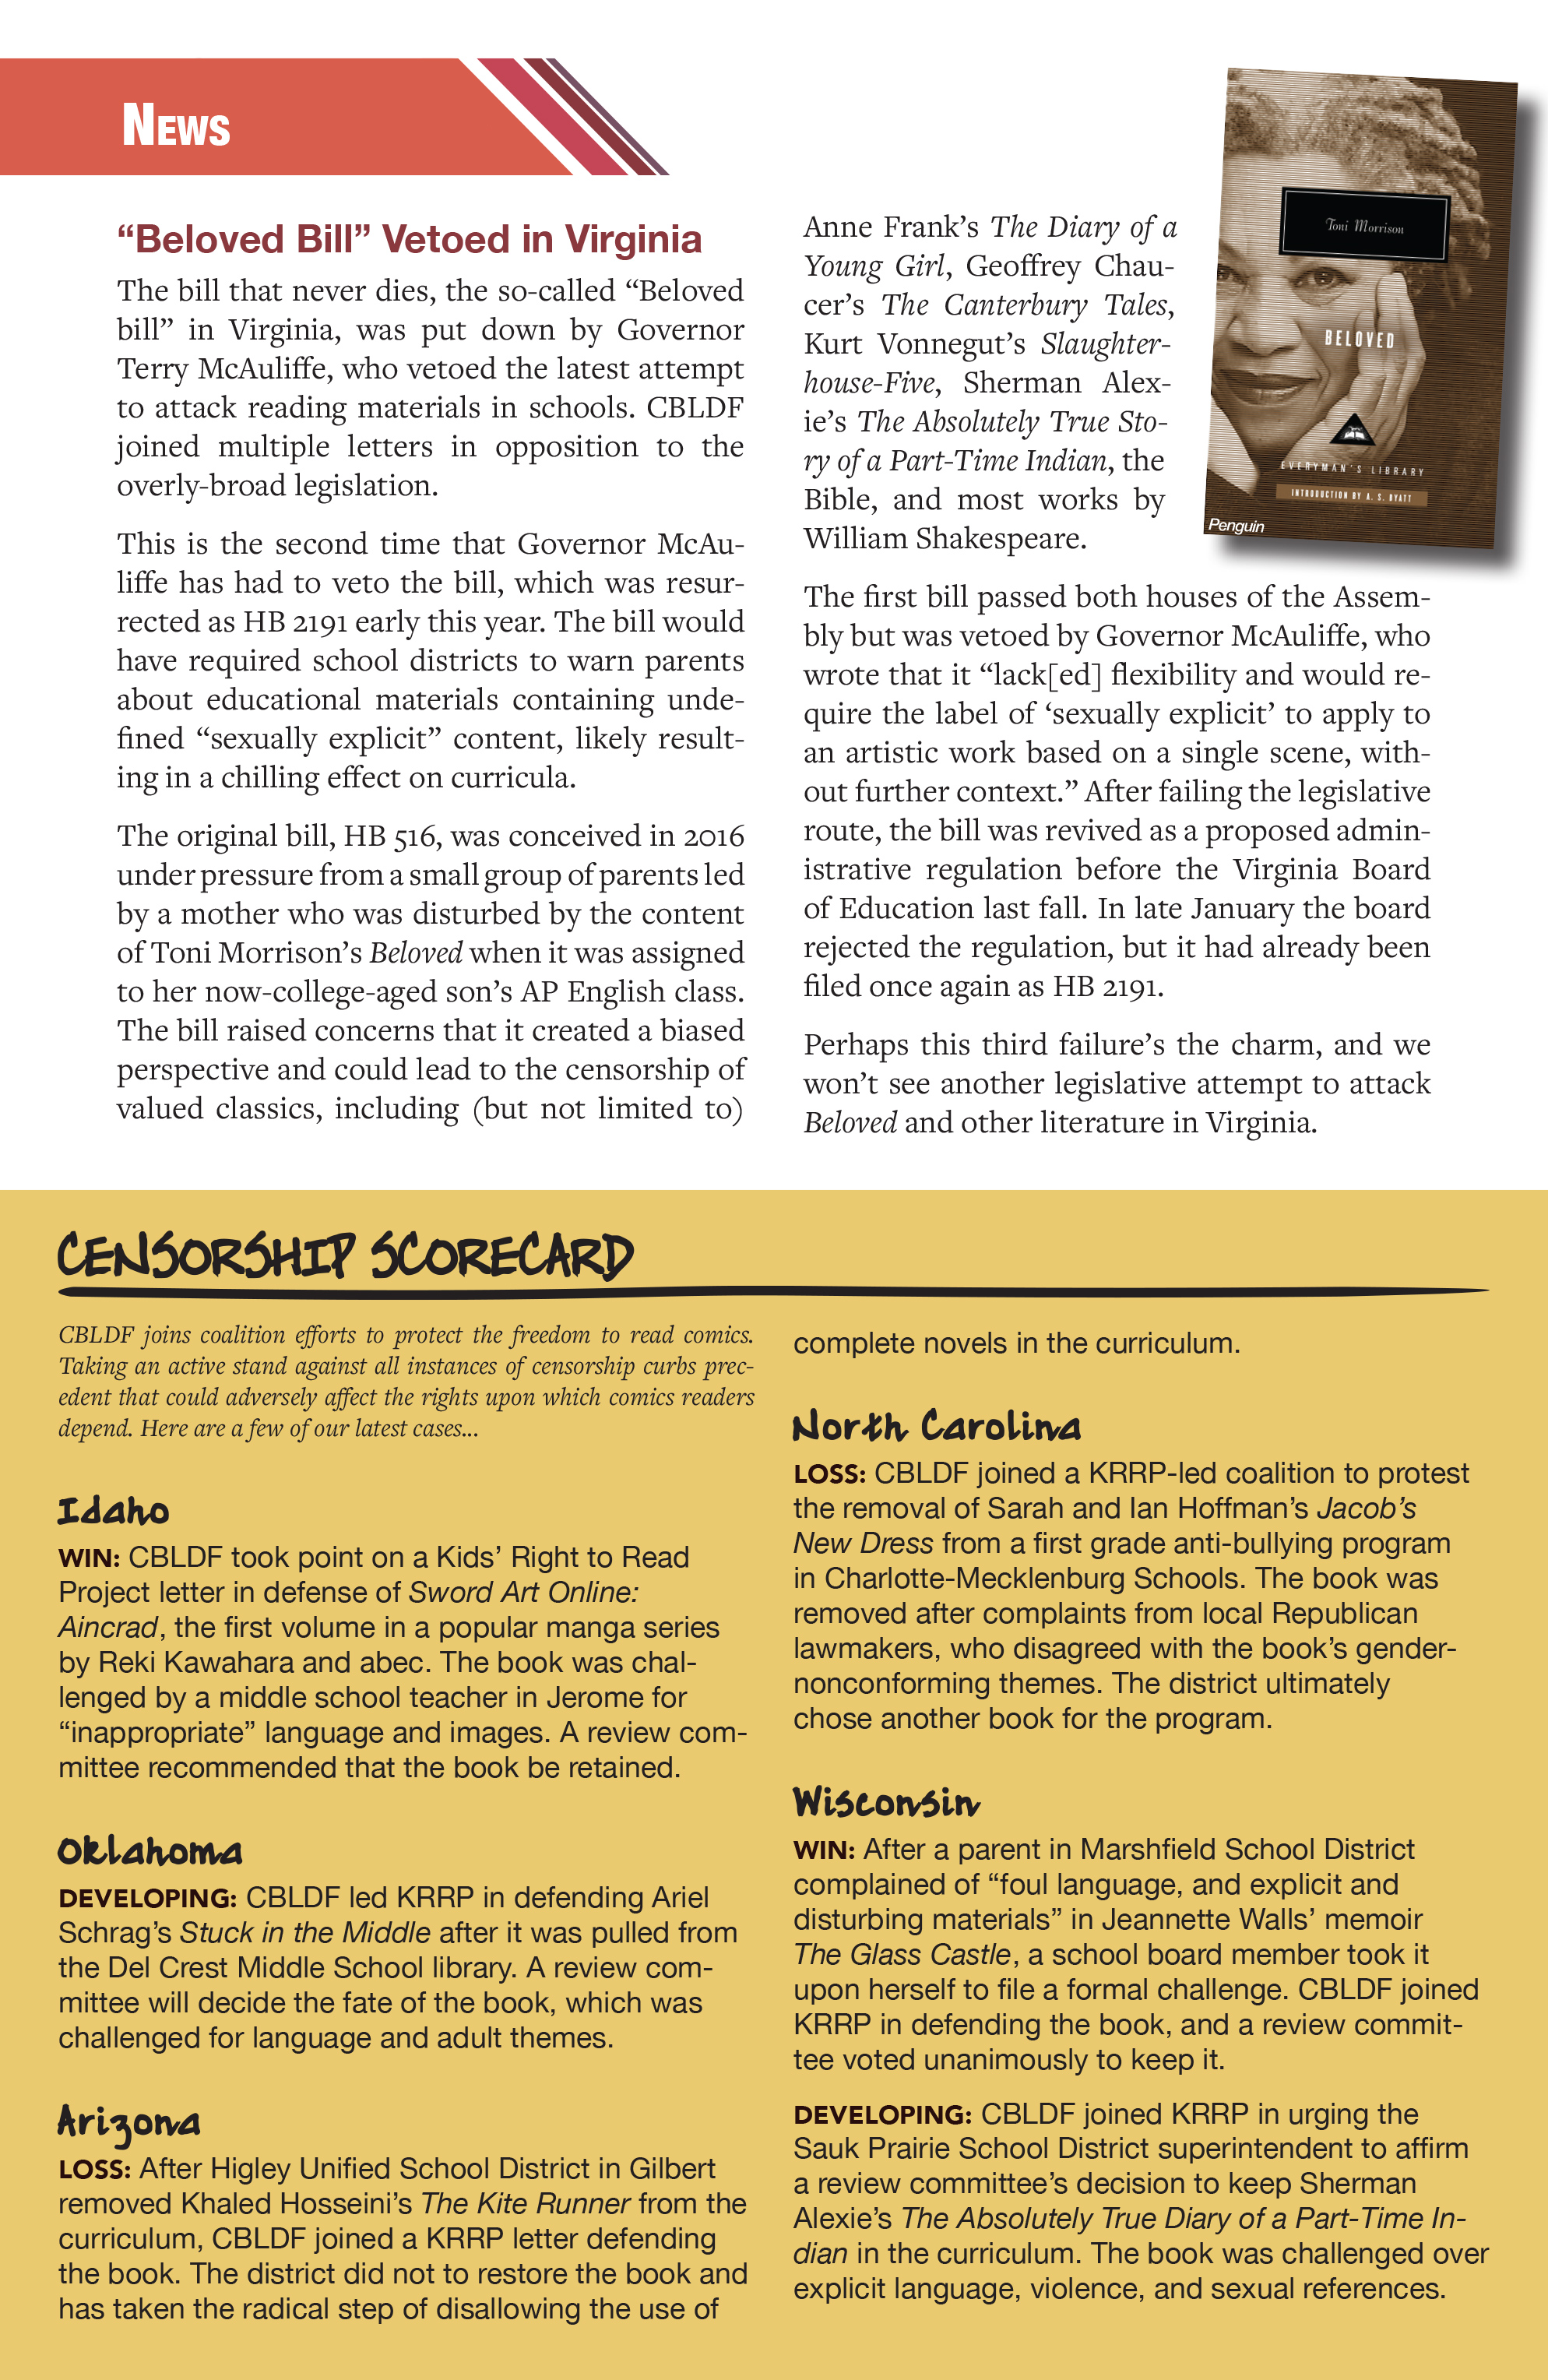 Read online CBLDF Defender Vol. 2 comic -  Issue #2 - 4